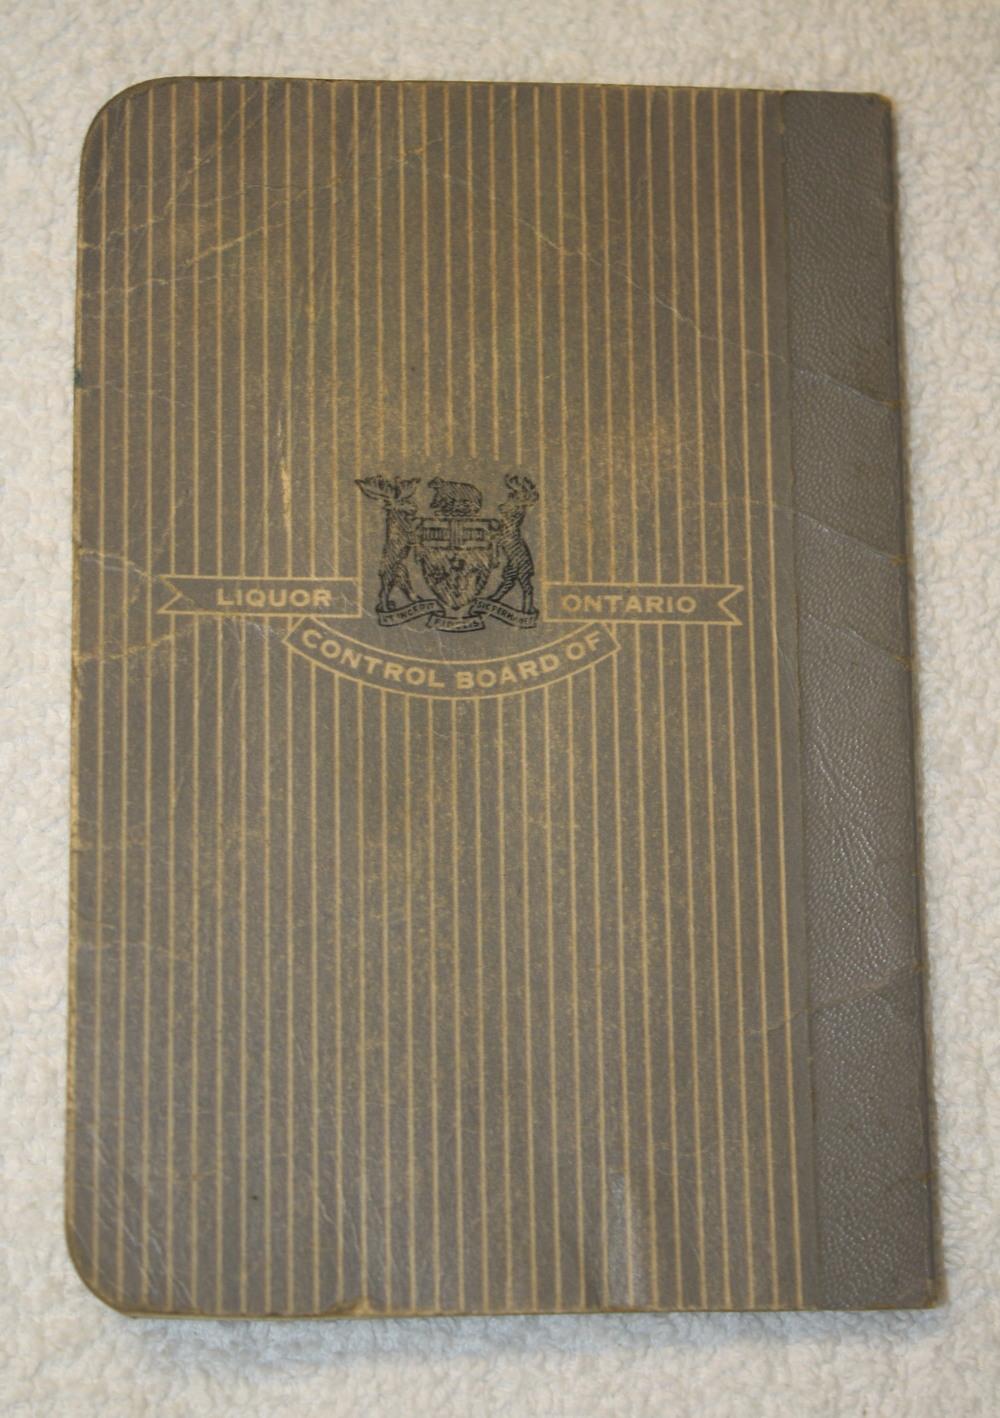 LCBO Liquor Permit Book_1955-1956_Belec_Back